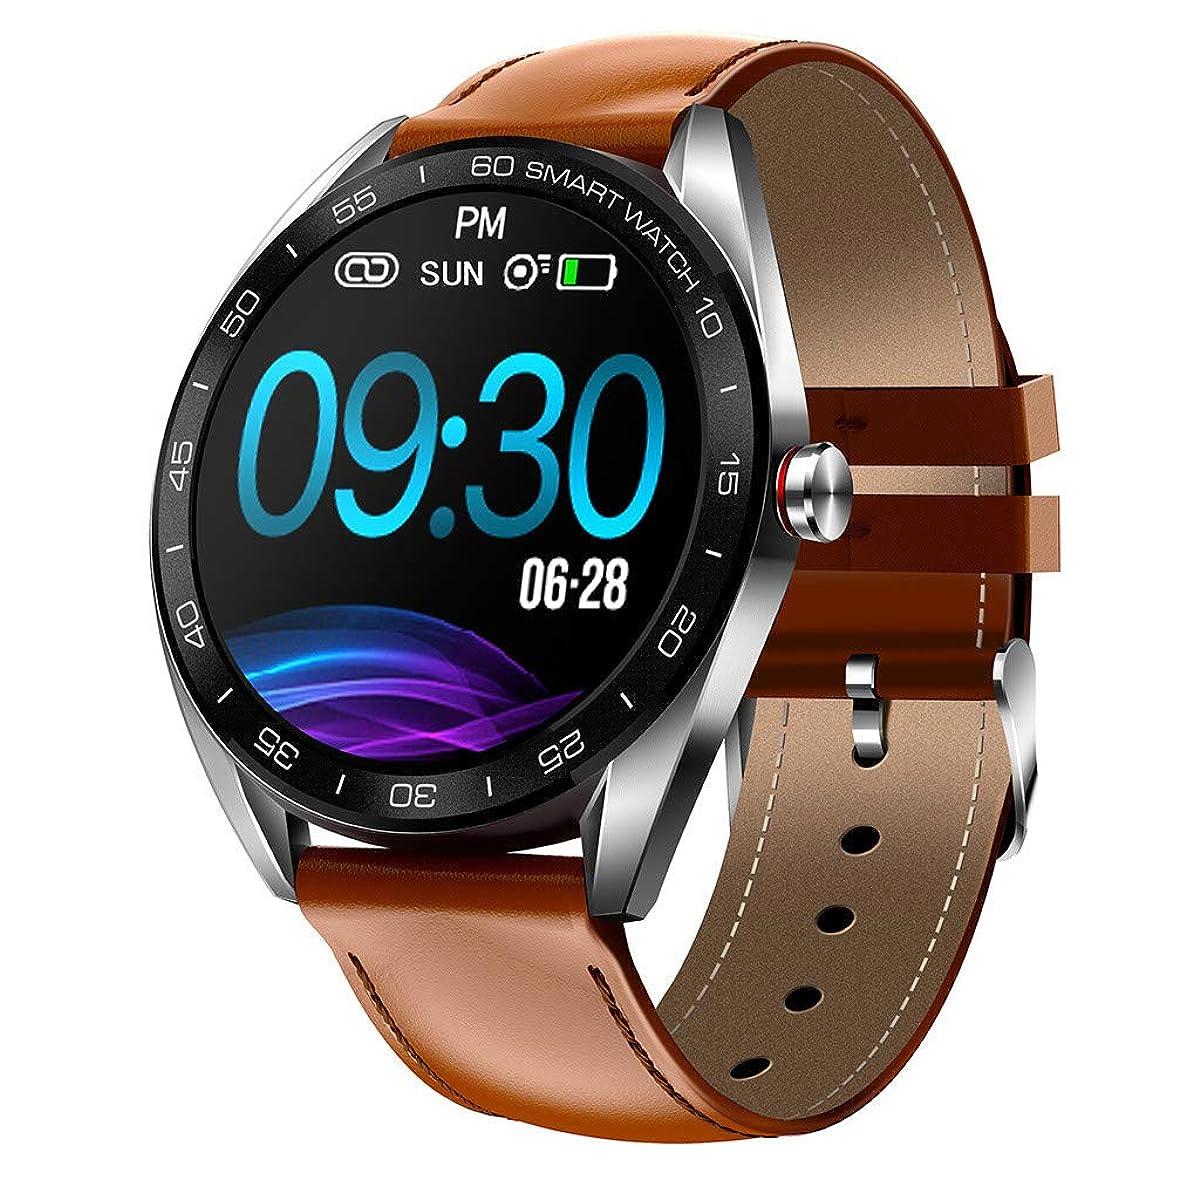 Mollikar Smart Watch, K7 iOS Android Smartwatch Heart Rate Blood Pressure Sleep Monitoring Smart Watch Sports Bracelet Compatible Android Samsung iOS Phone XS X8 7 6 5 Men Women